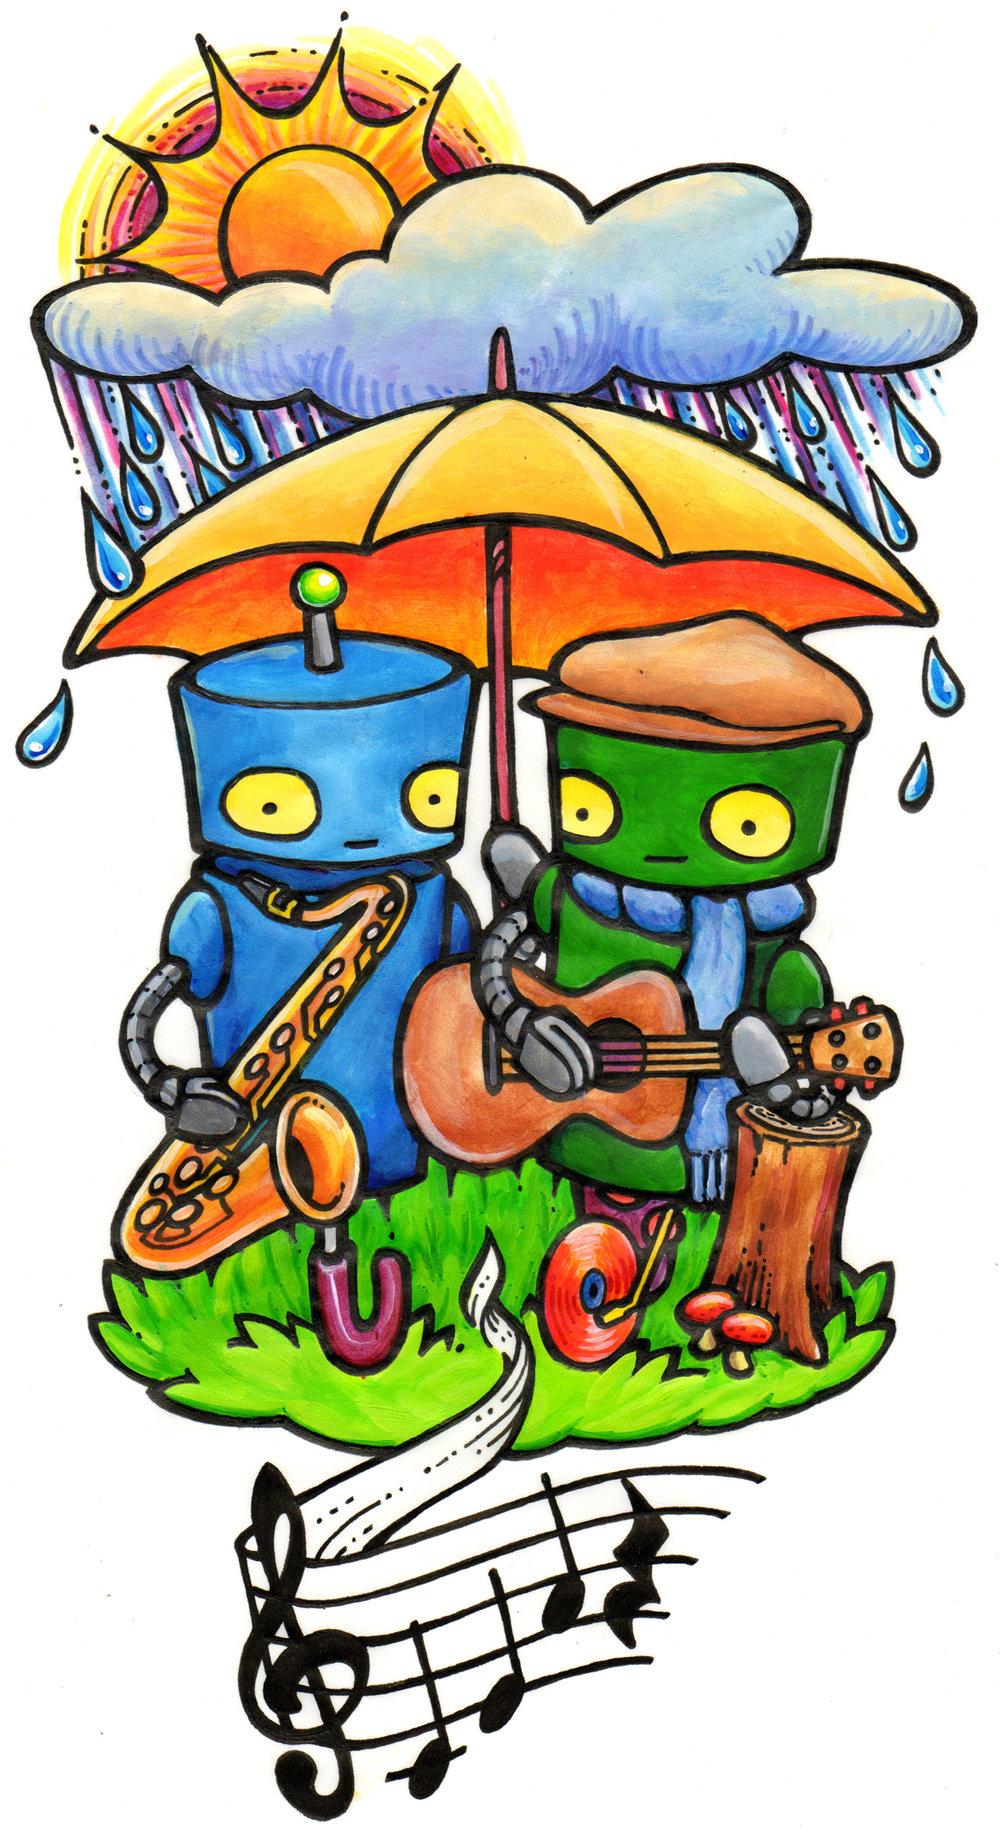 tattoo-rainyday.jpg